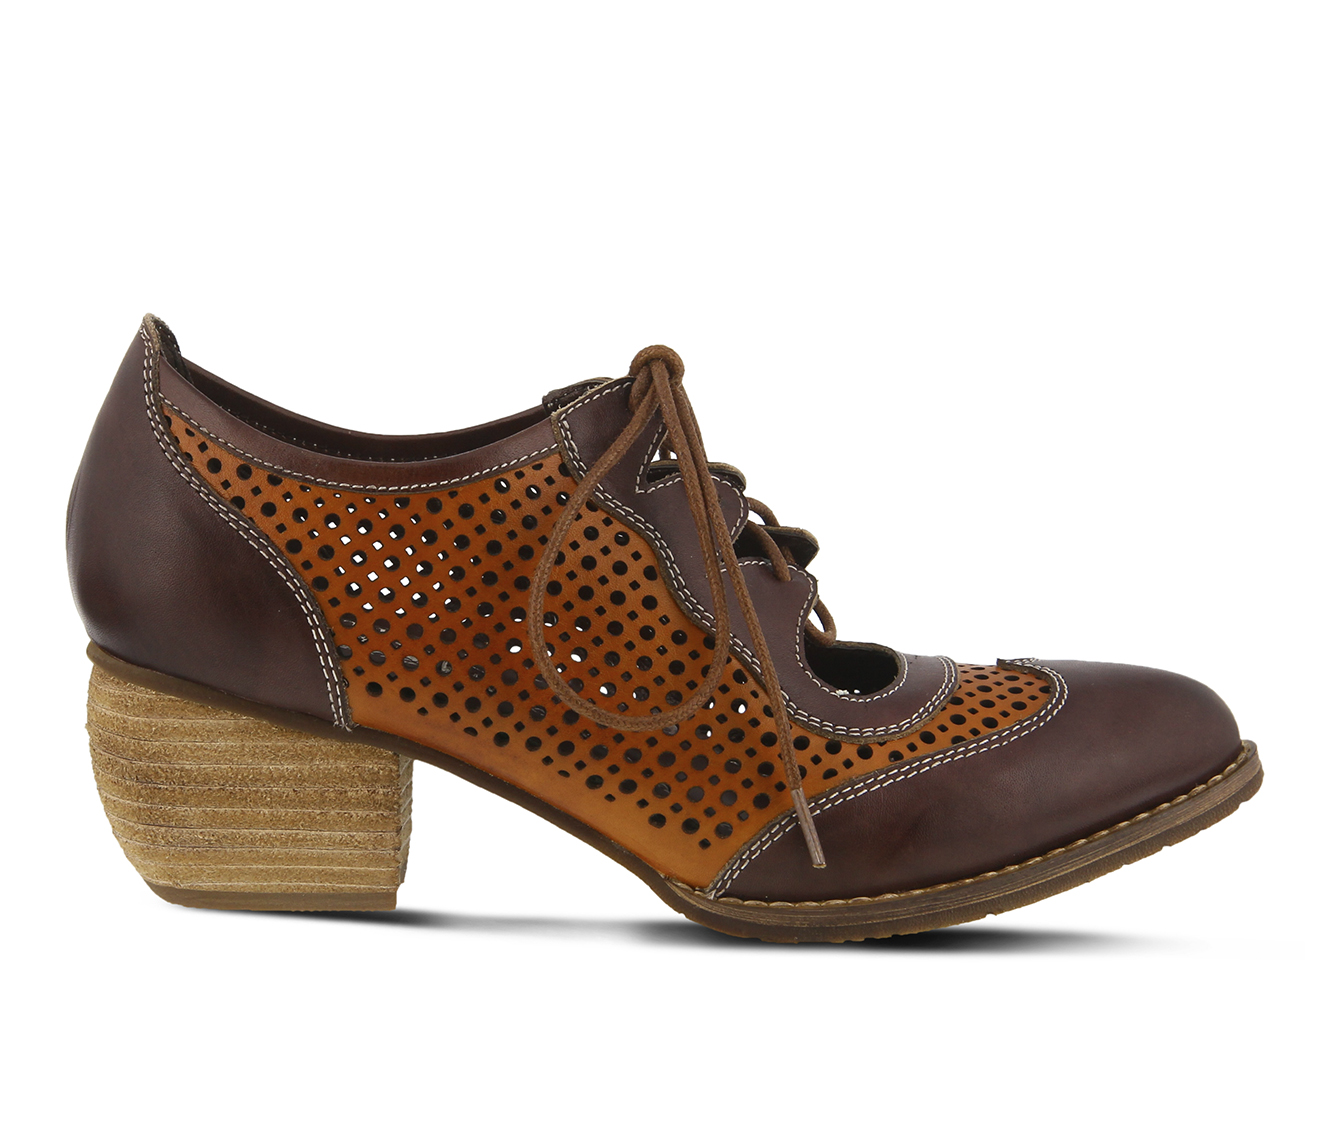 L'Artiste Gabriel Women's Shoe (Brown Leather)